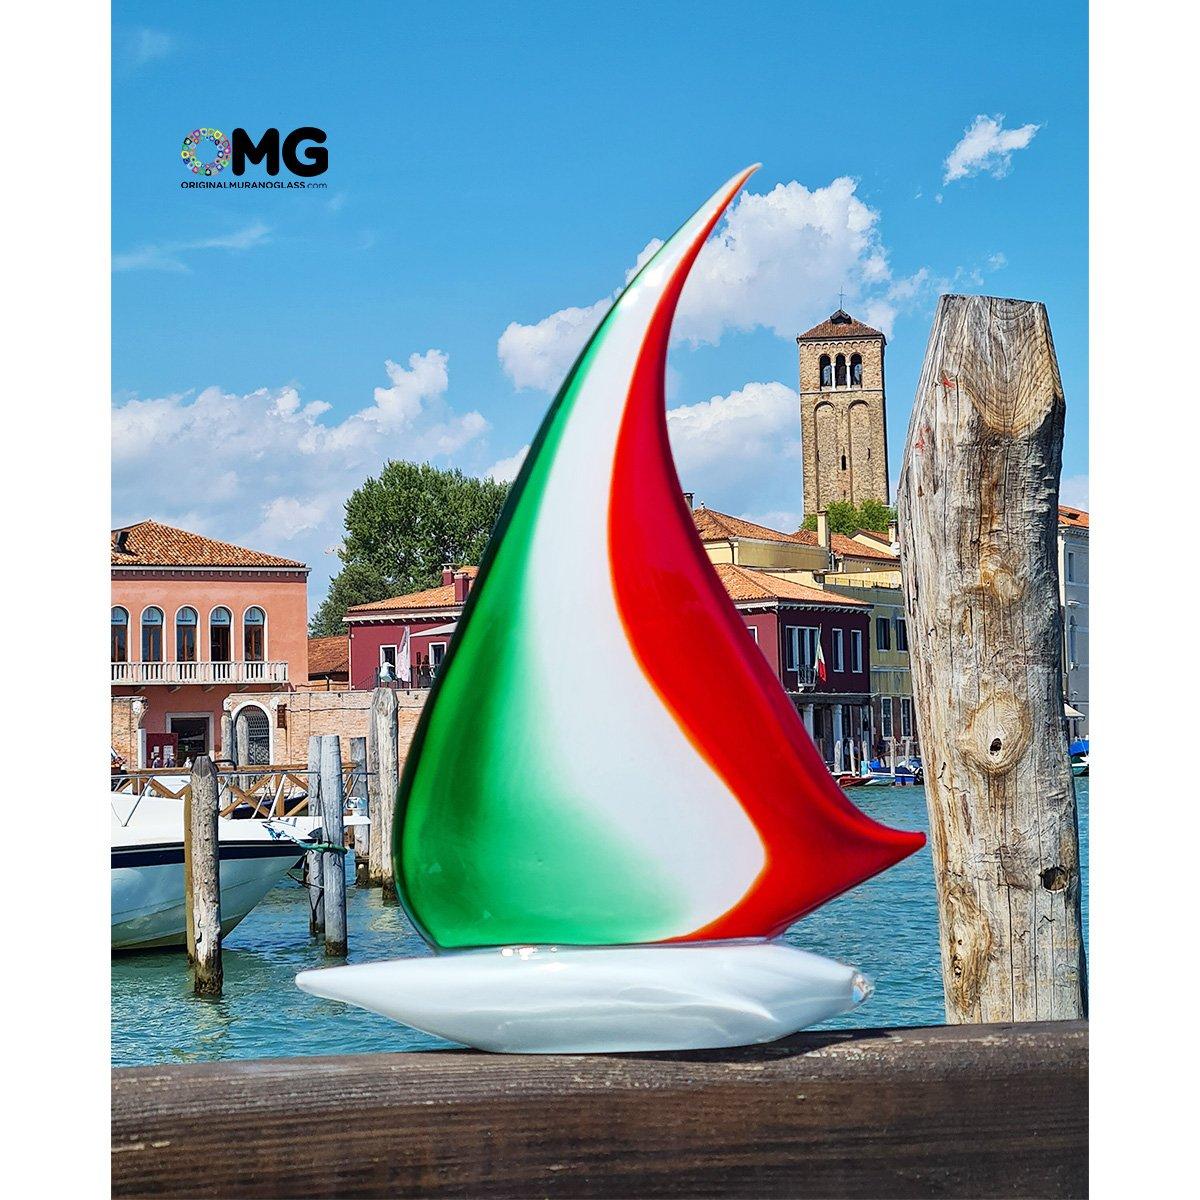 Sail Boat Italy Flag  - Original Murano Glass sculpture